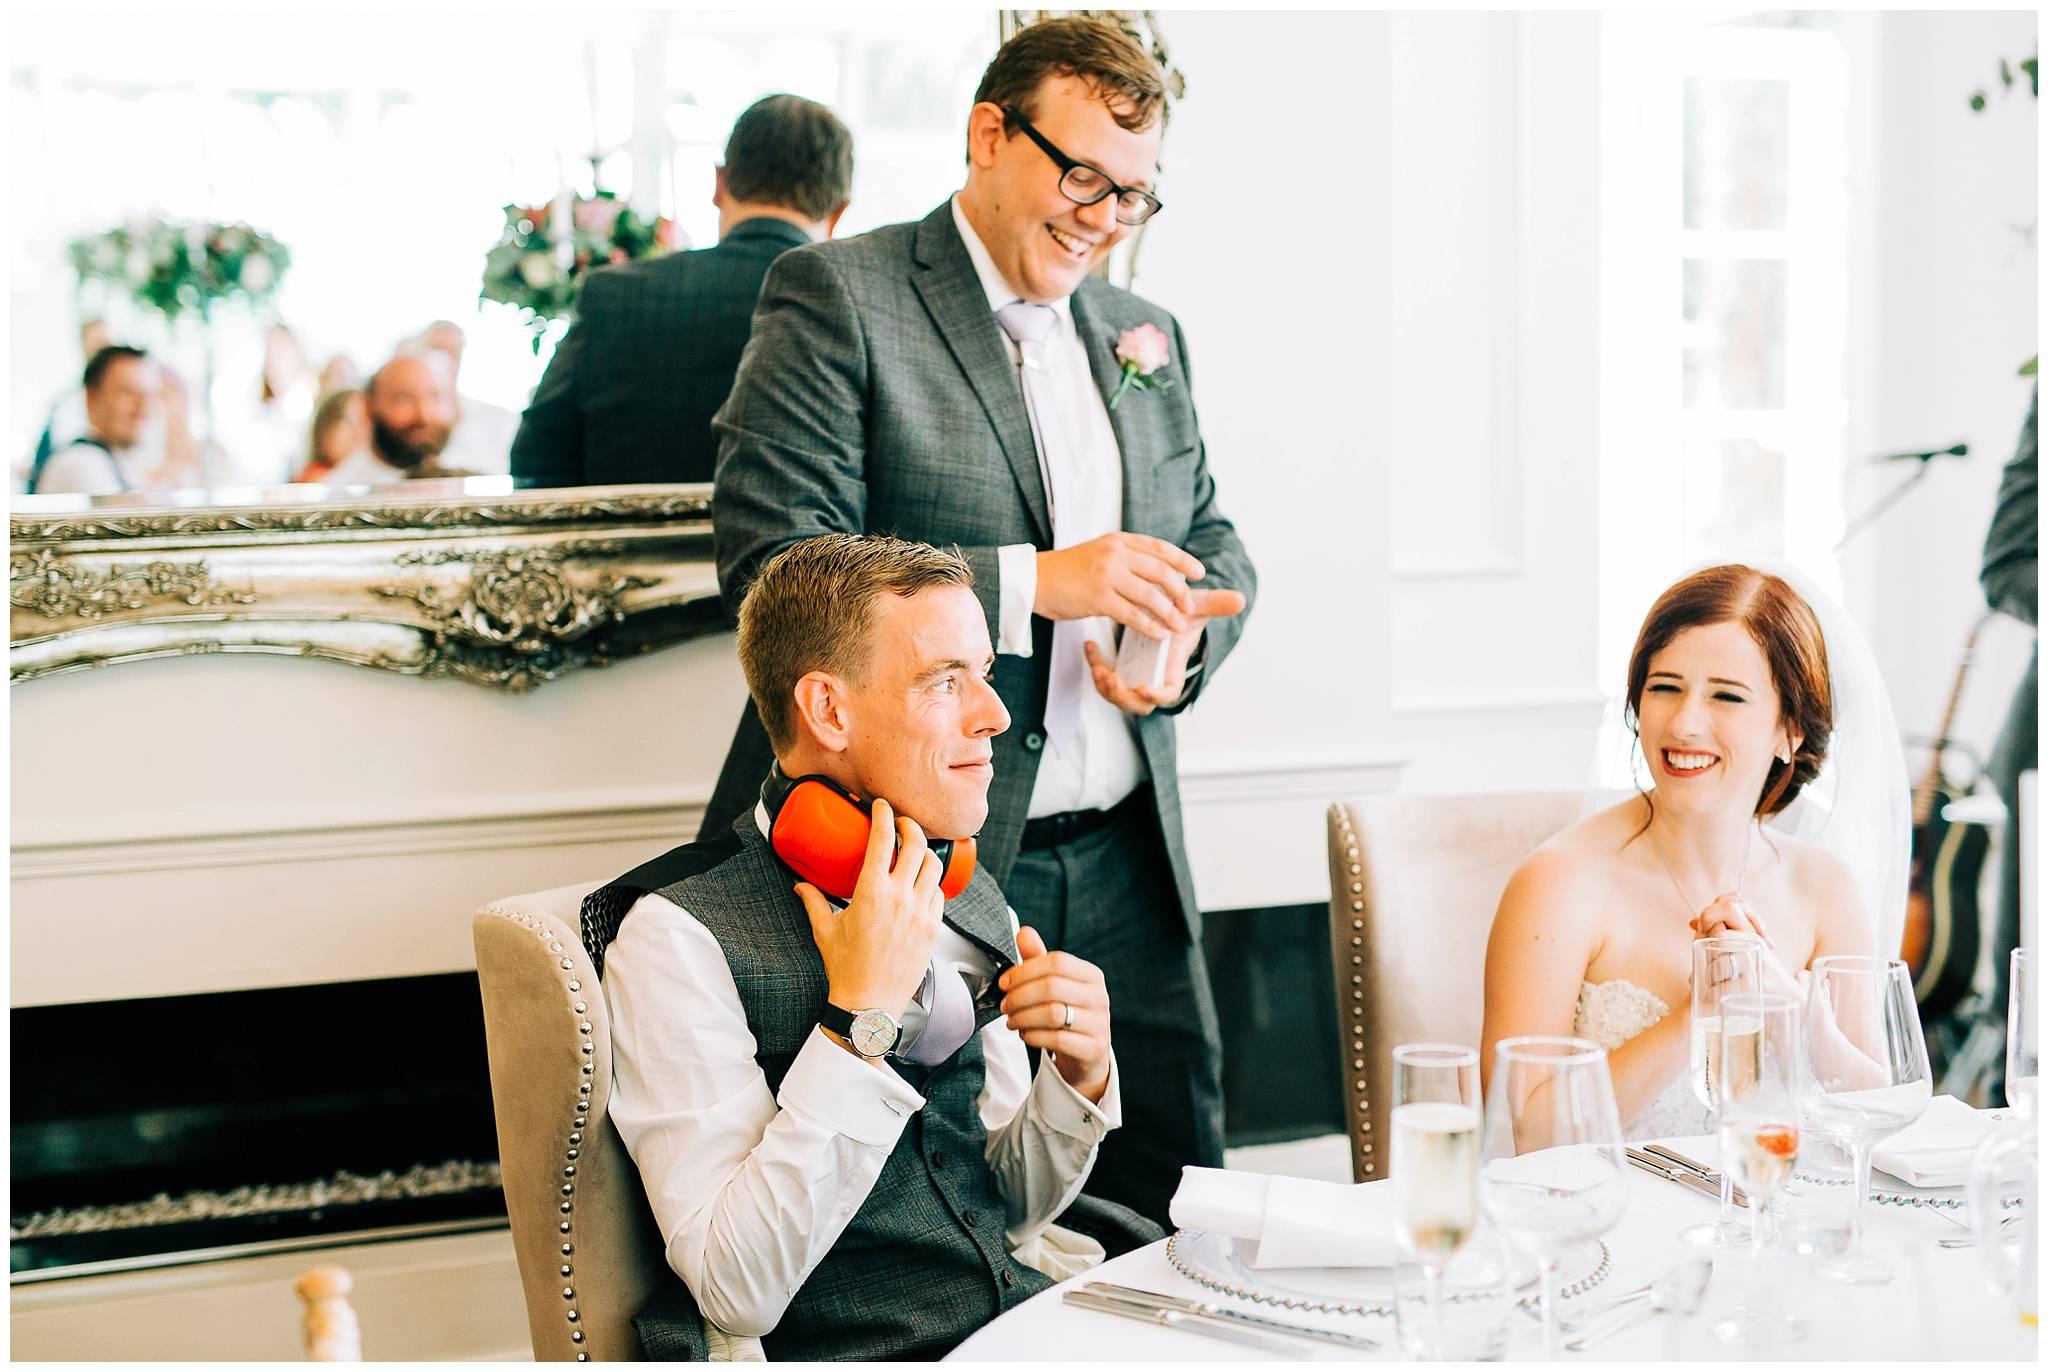 Summer Garden Wedding - The Old Vicarage Boutique Hotel69.jpg